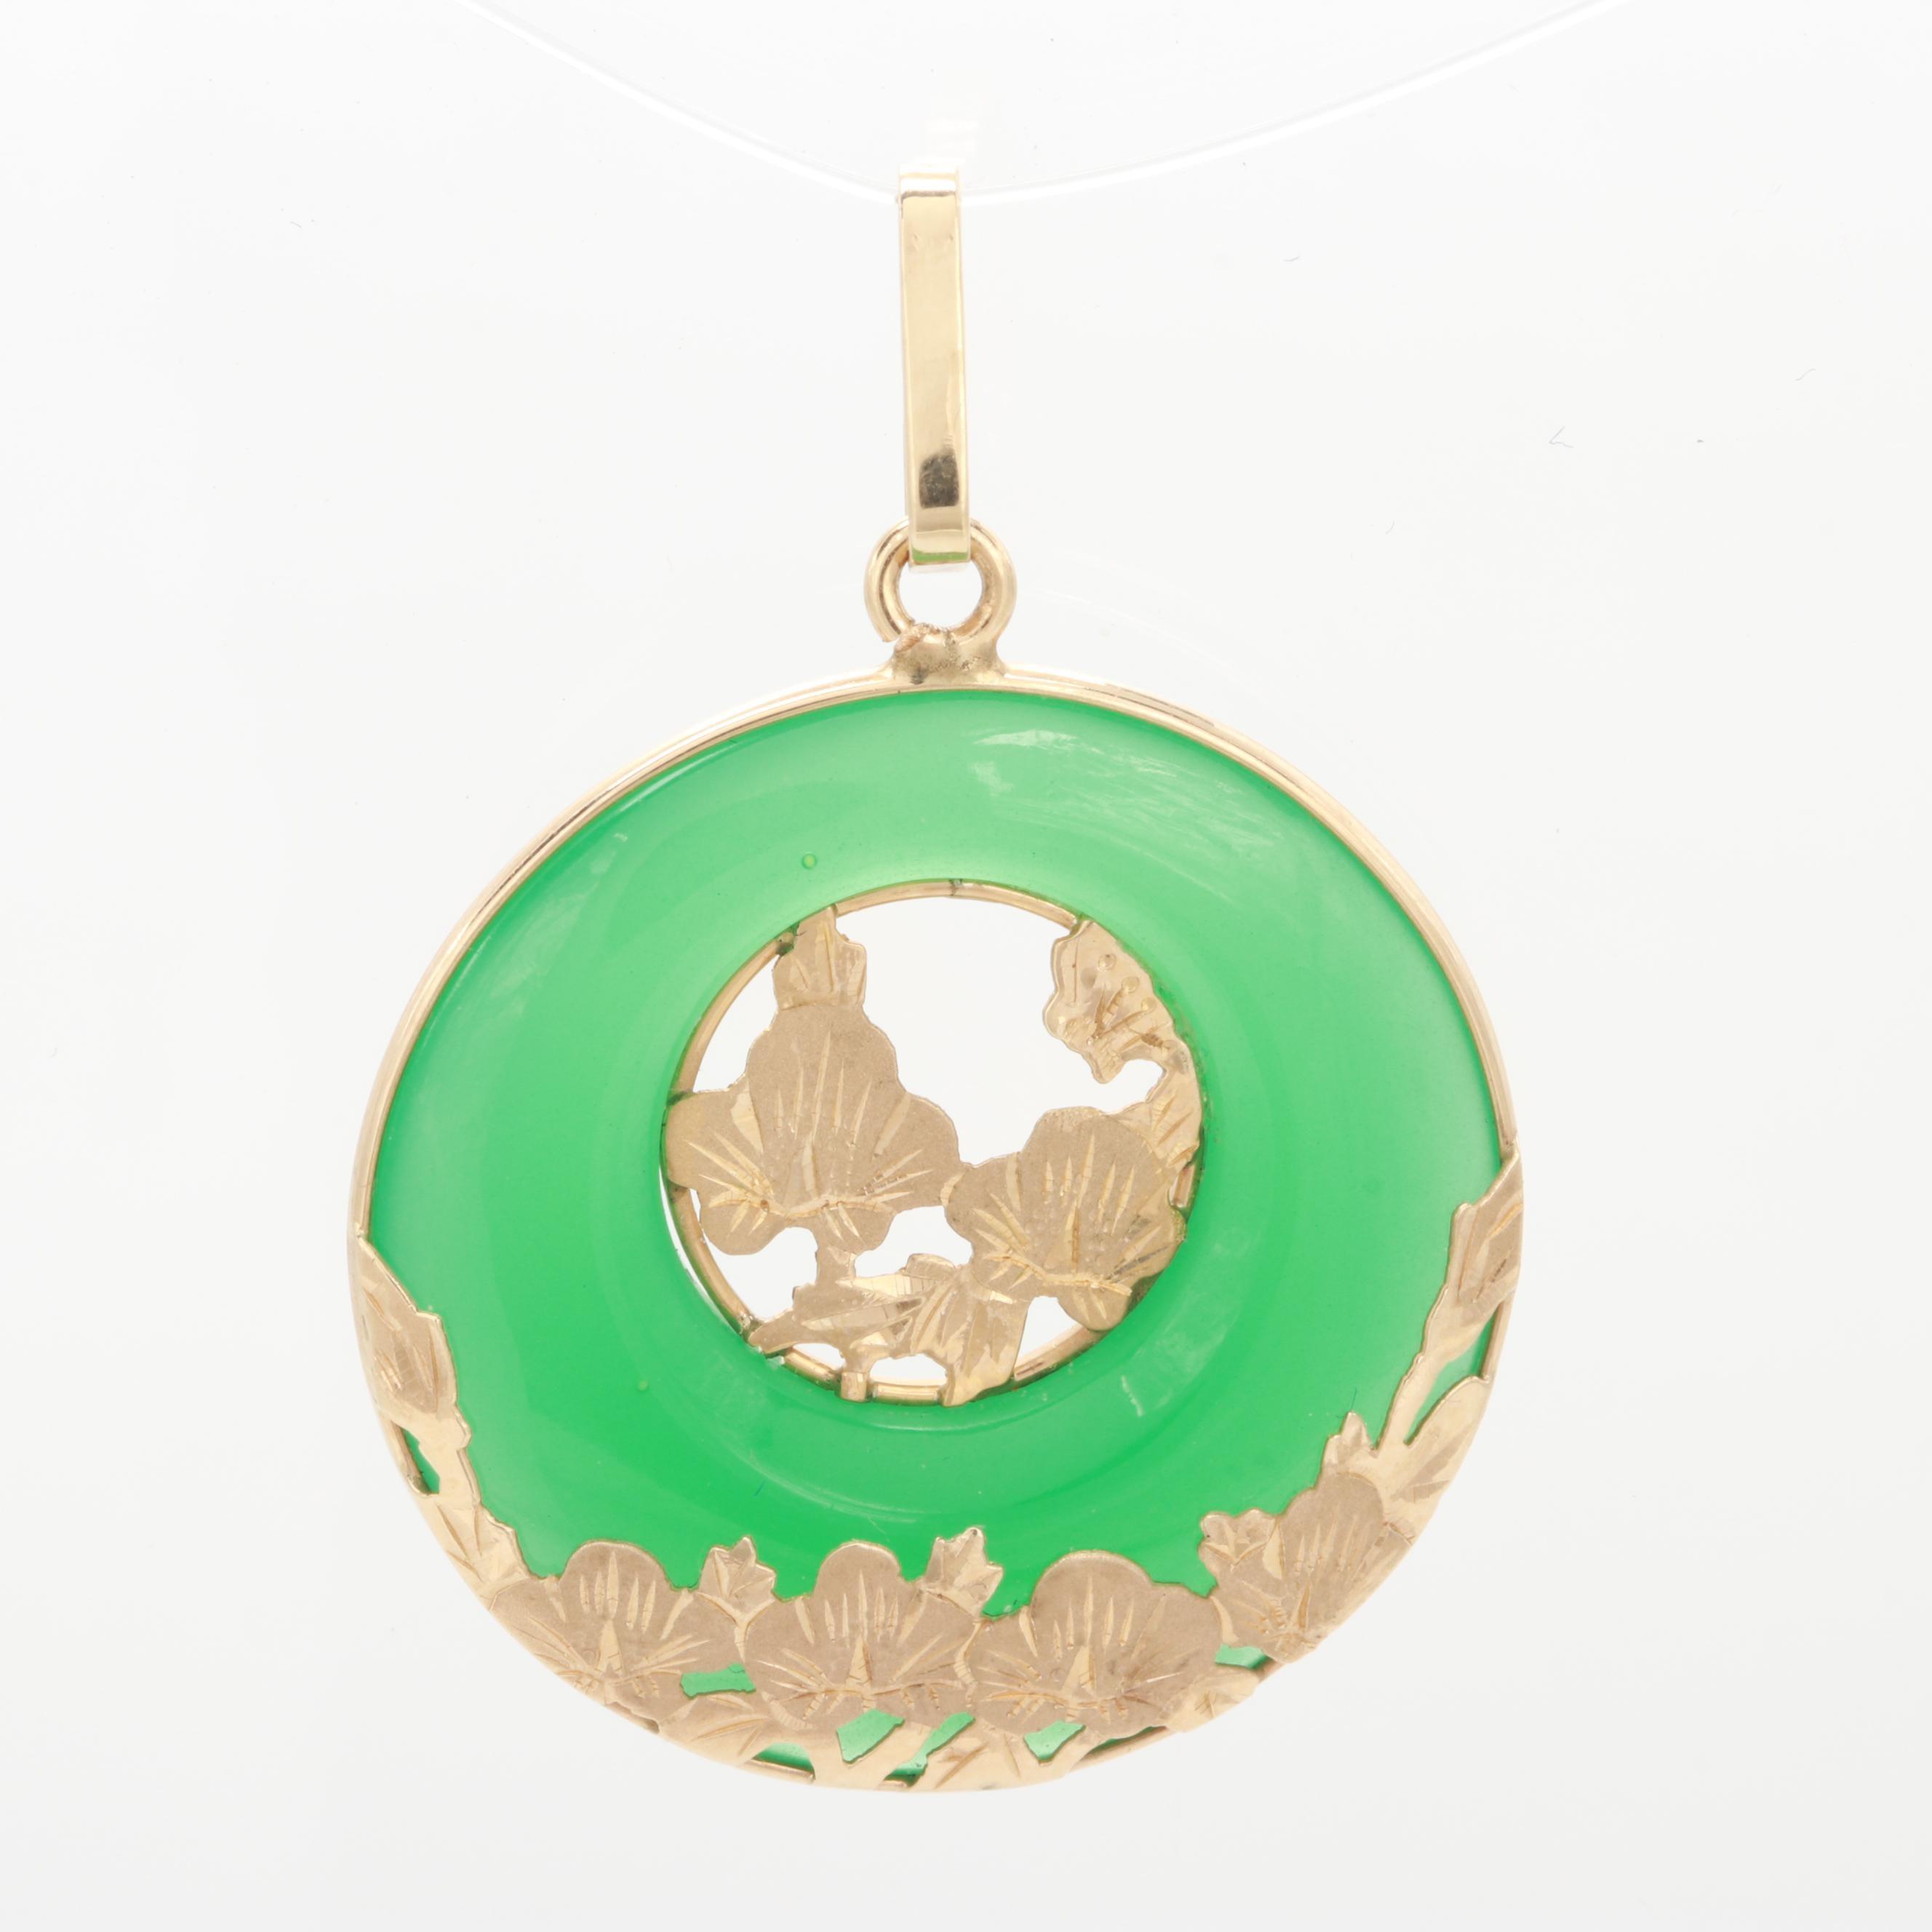 14K Yellow Gold Green Glass Pendant